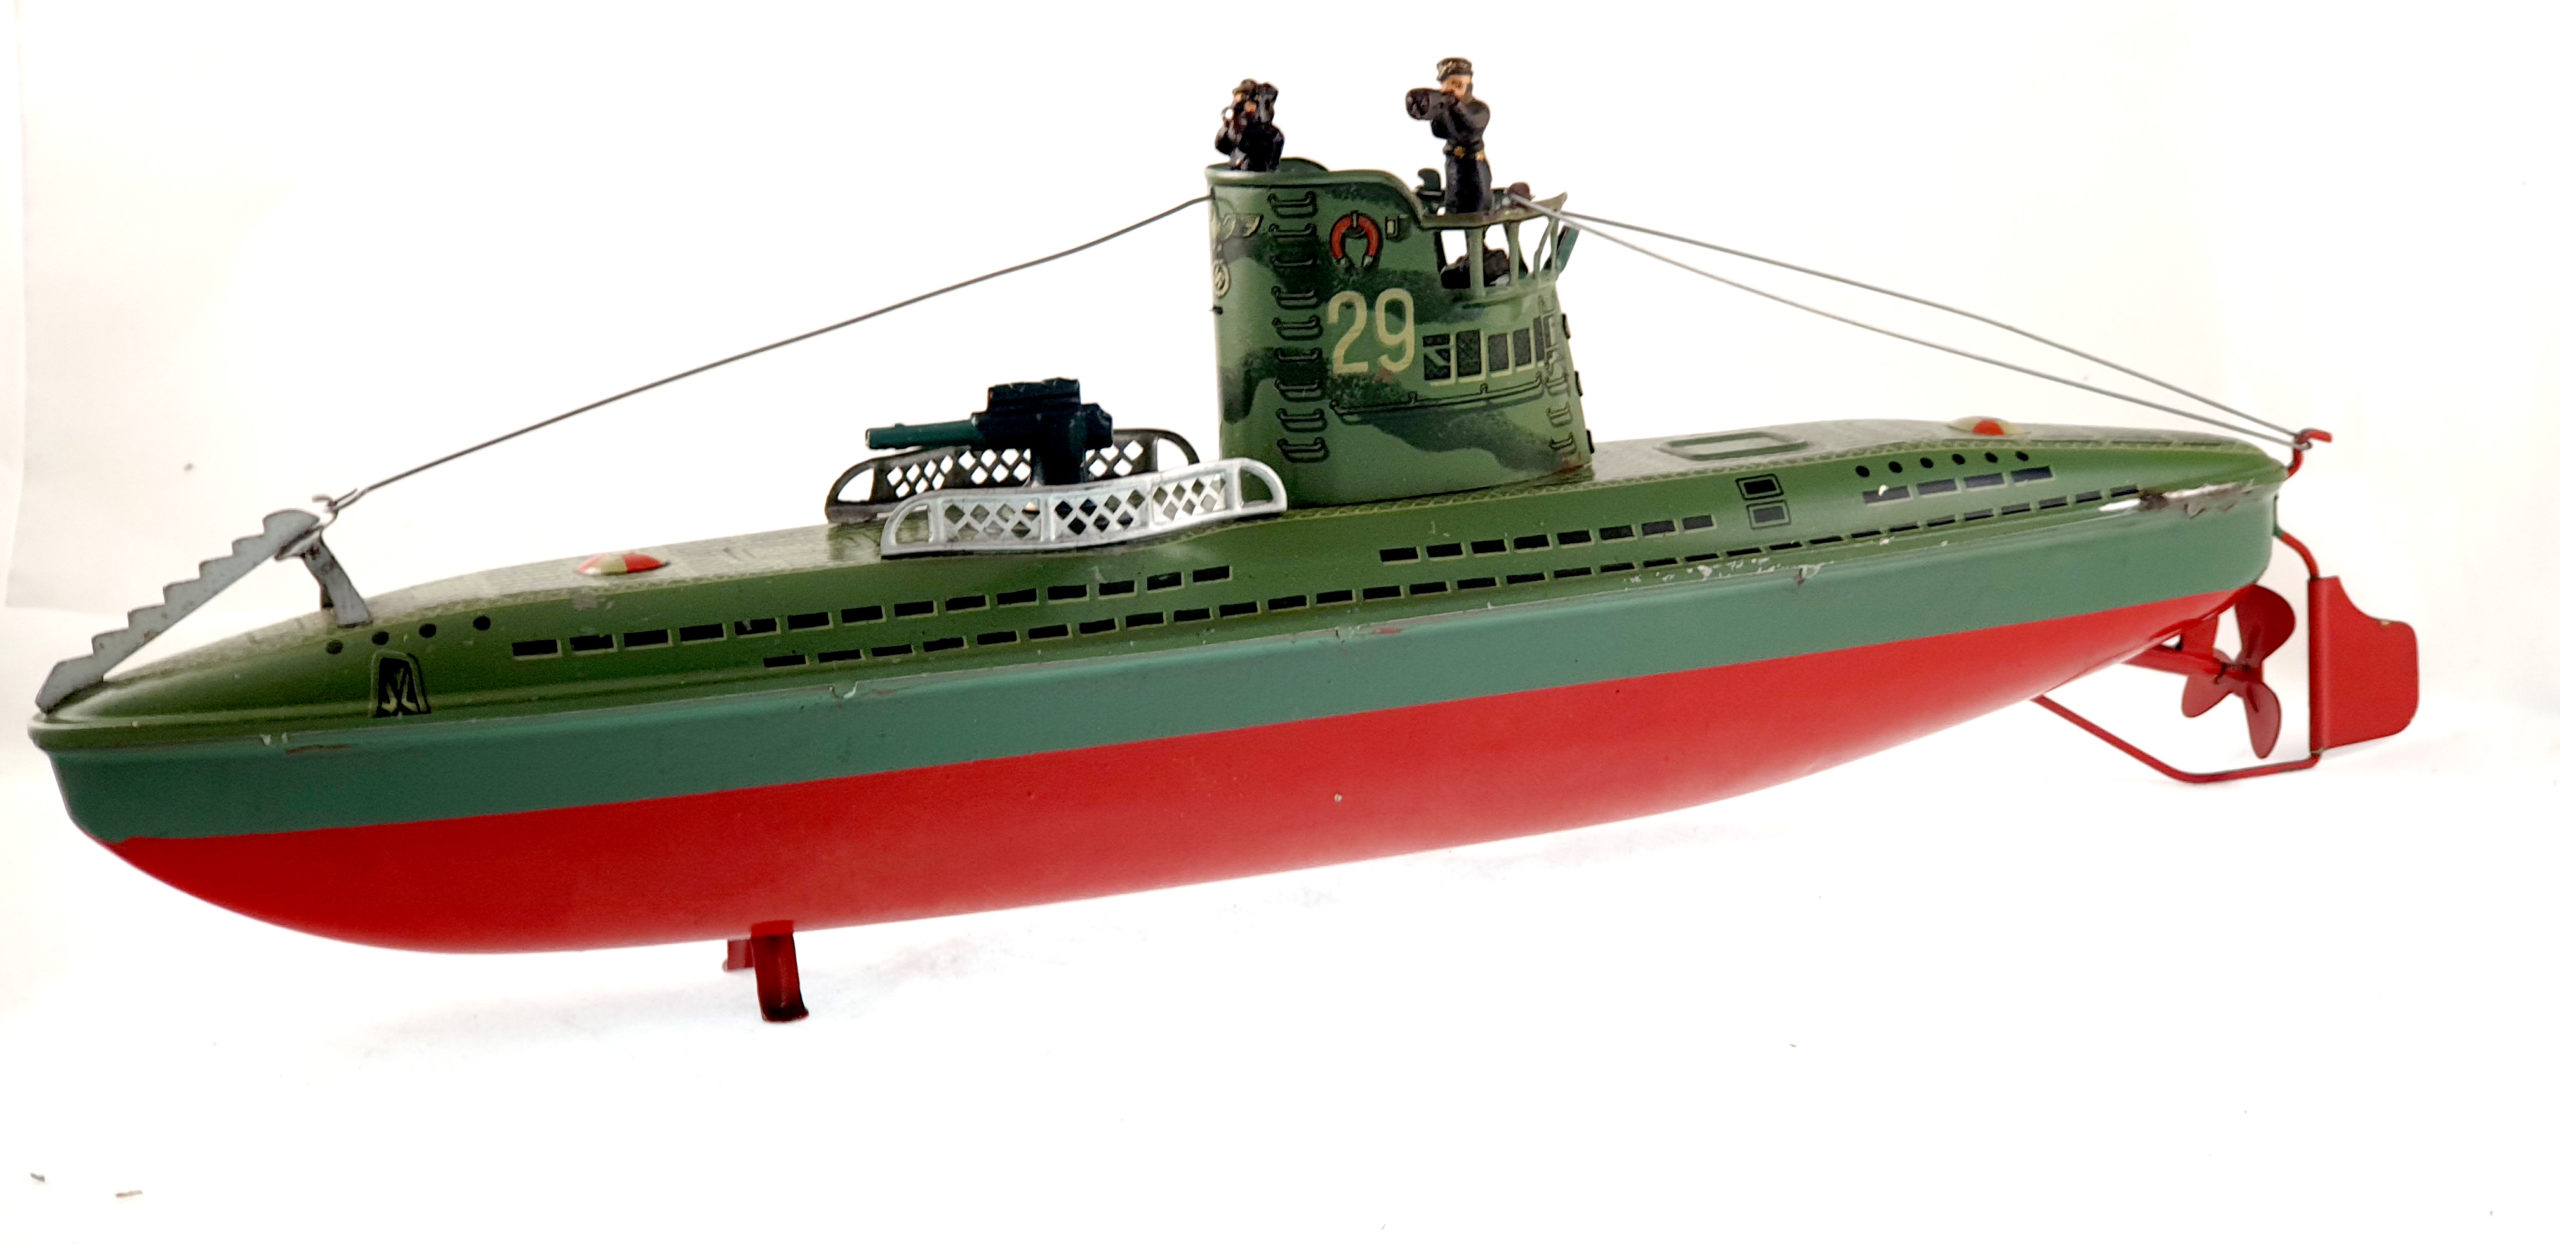 Sottomarino 2005 - 1938